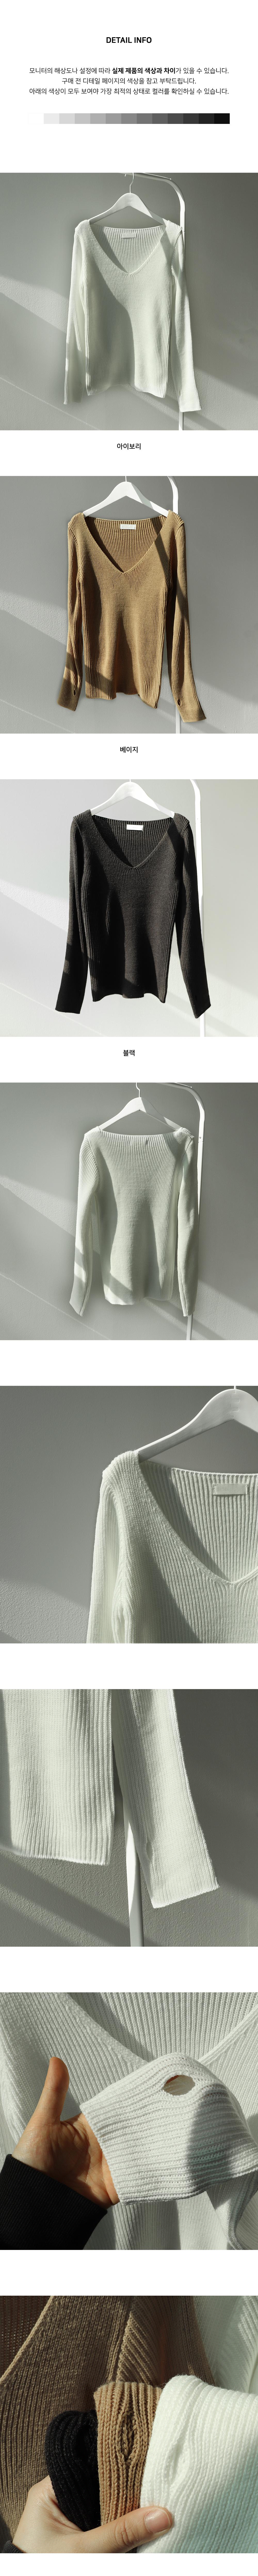 Cramble V-neck warmer knit